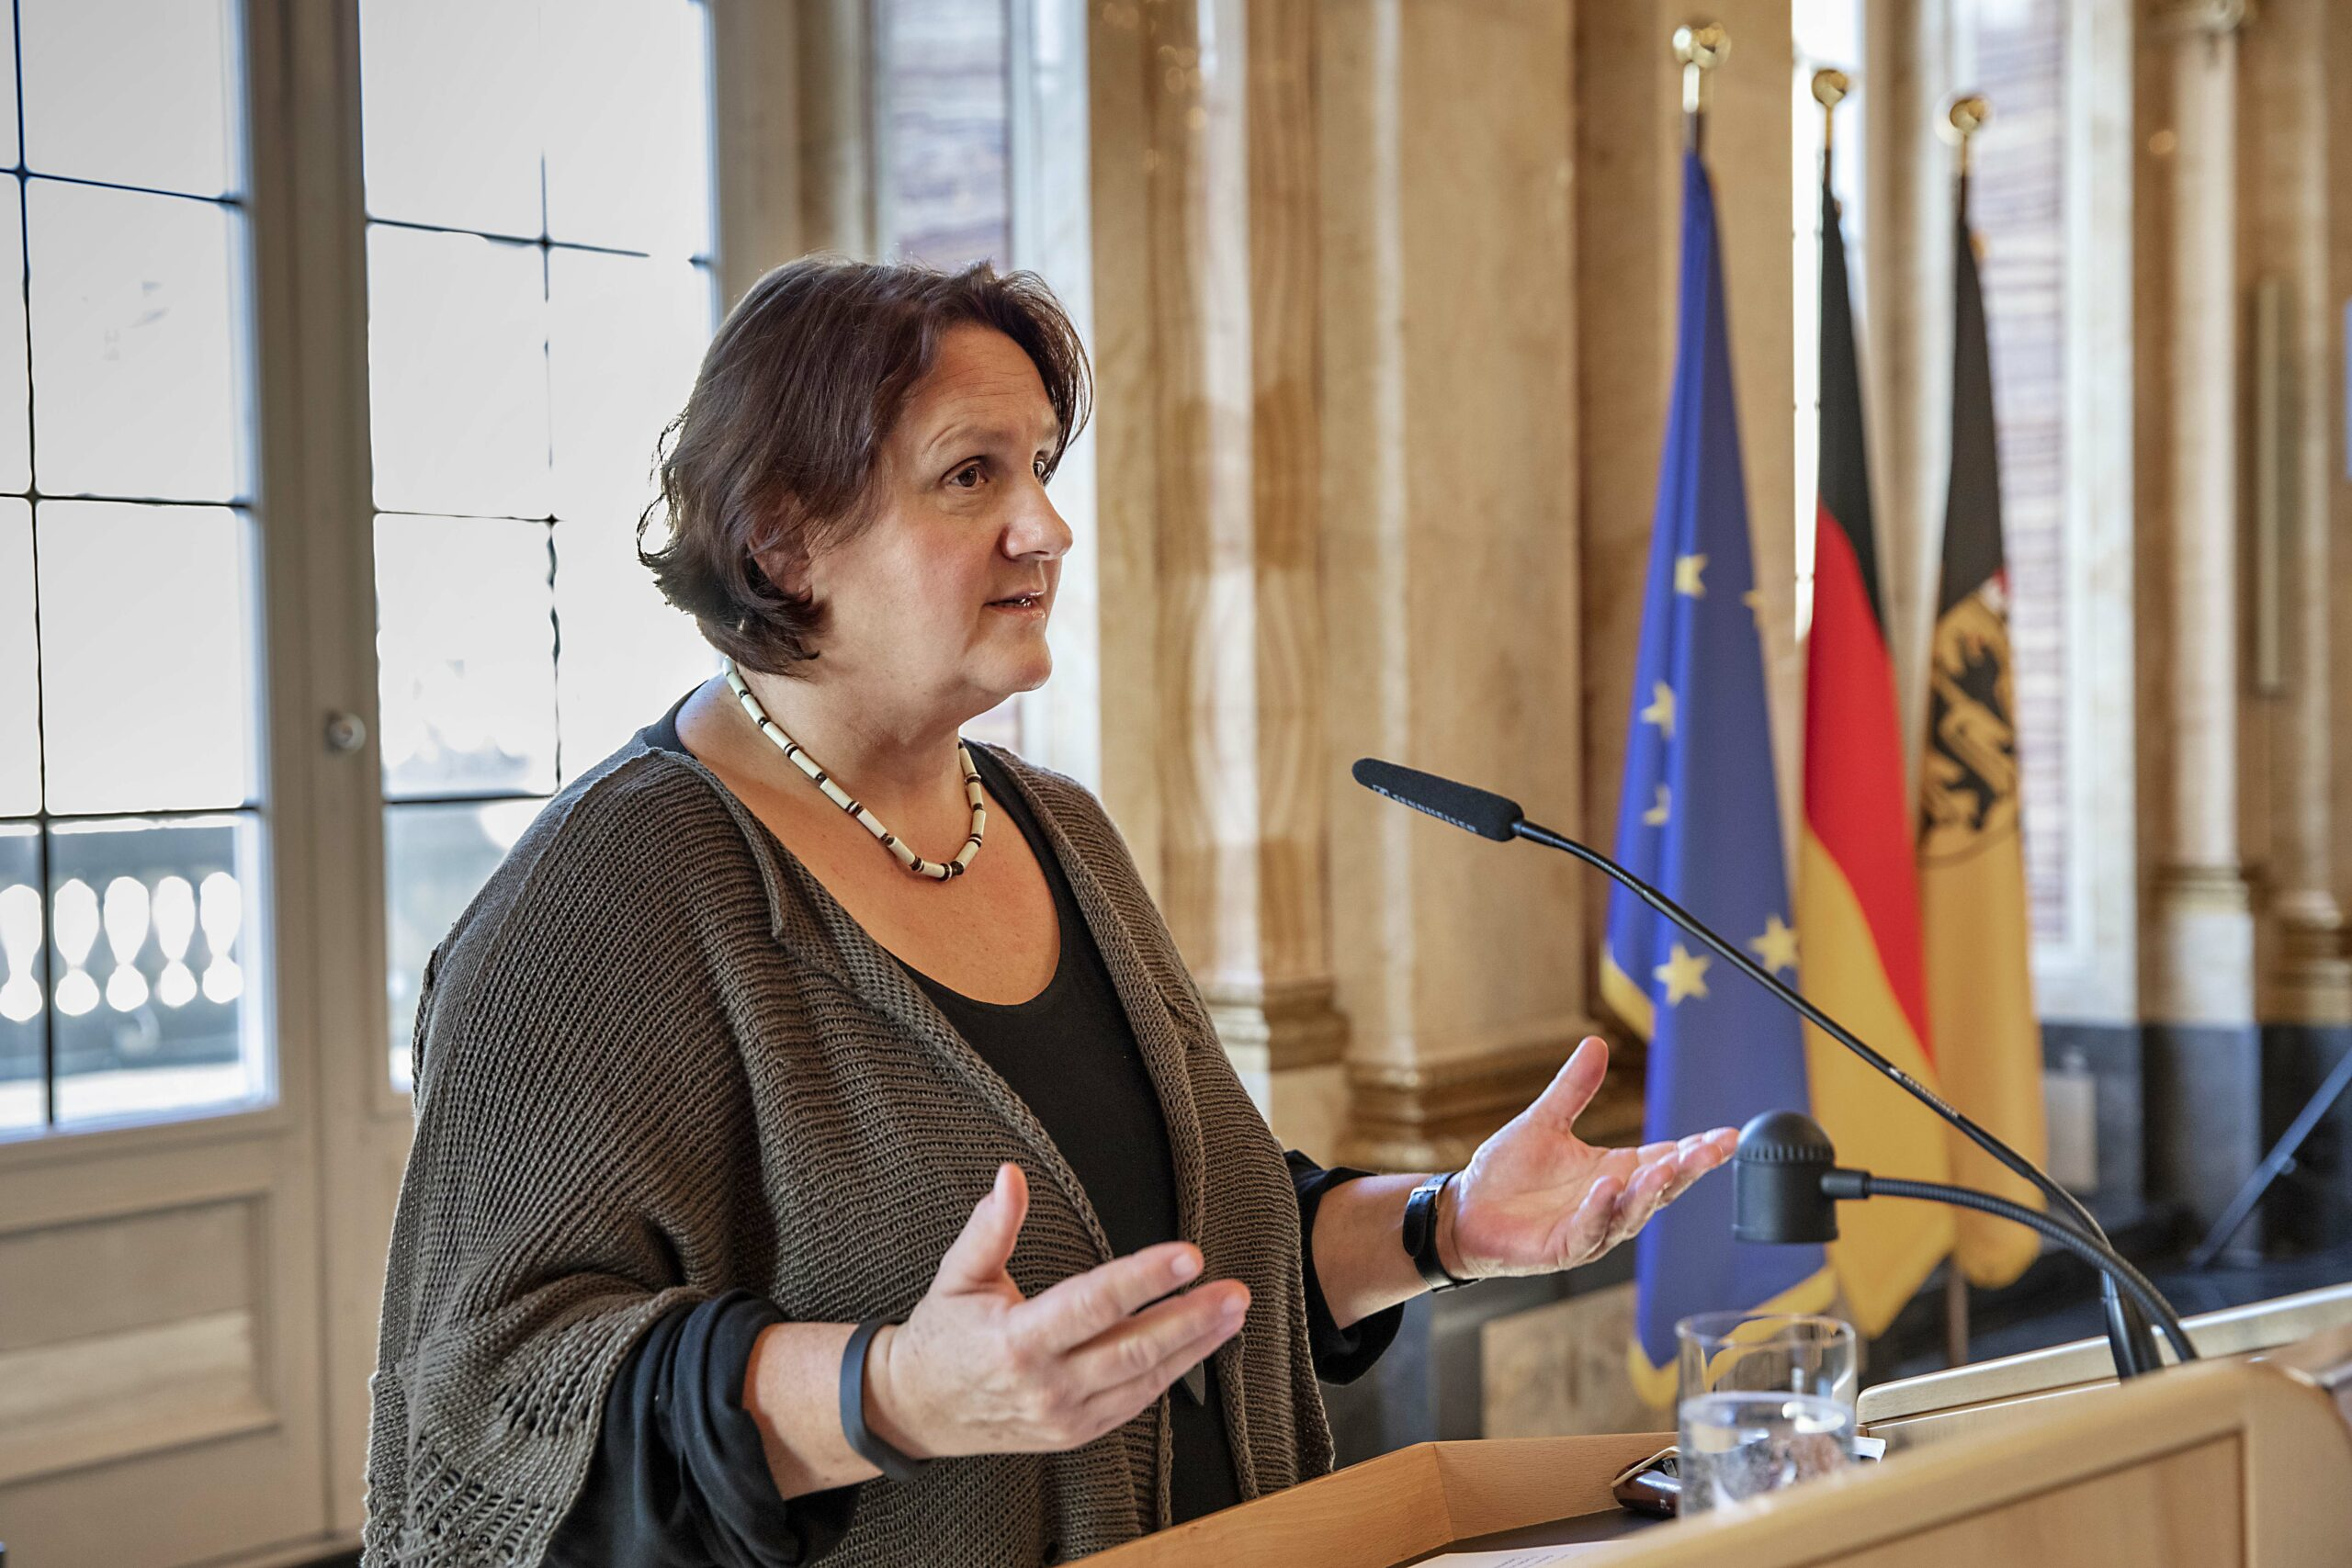 Staatsministerin Theresa Schopper